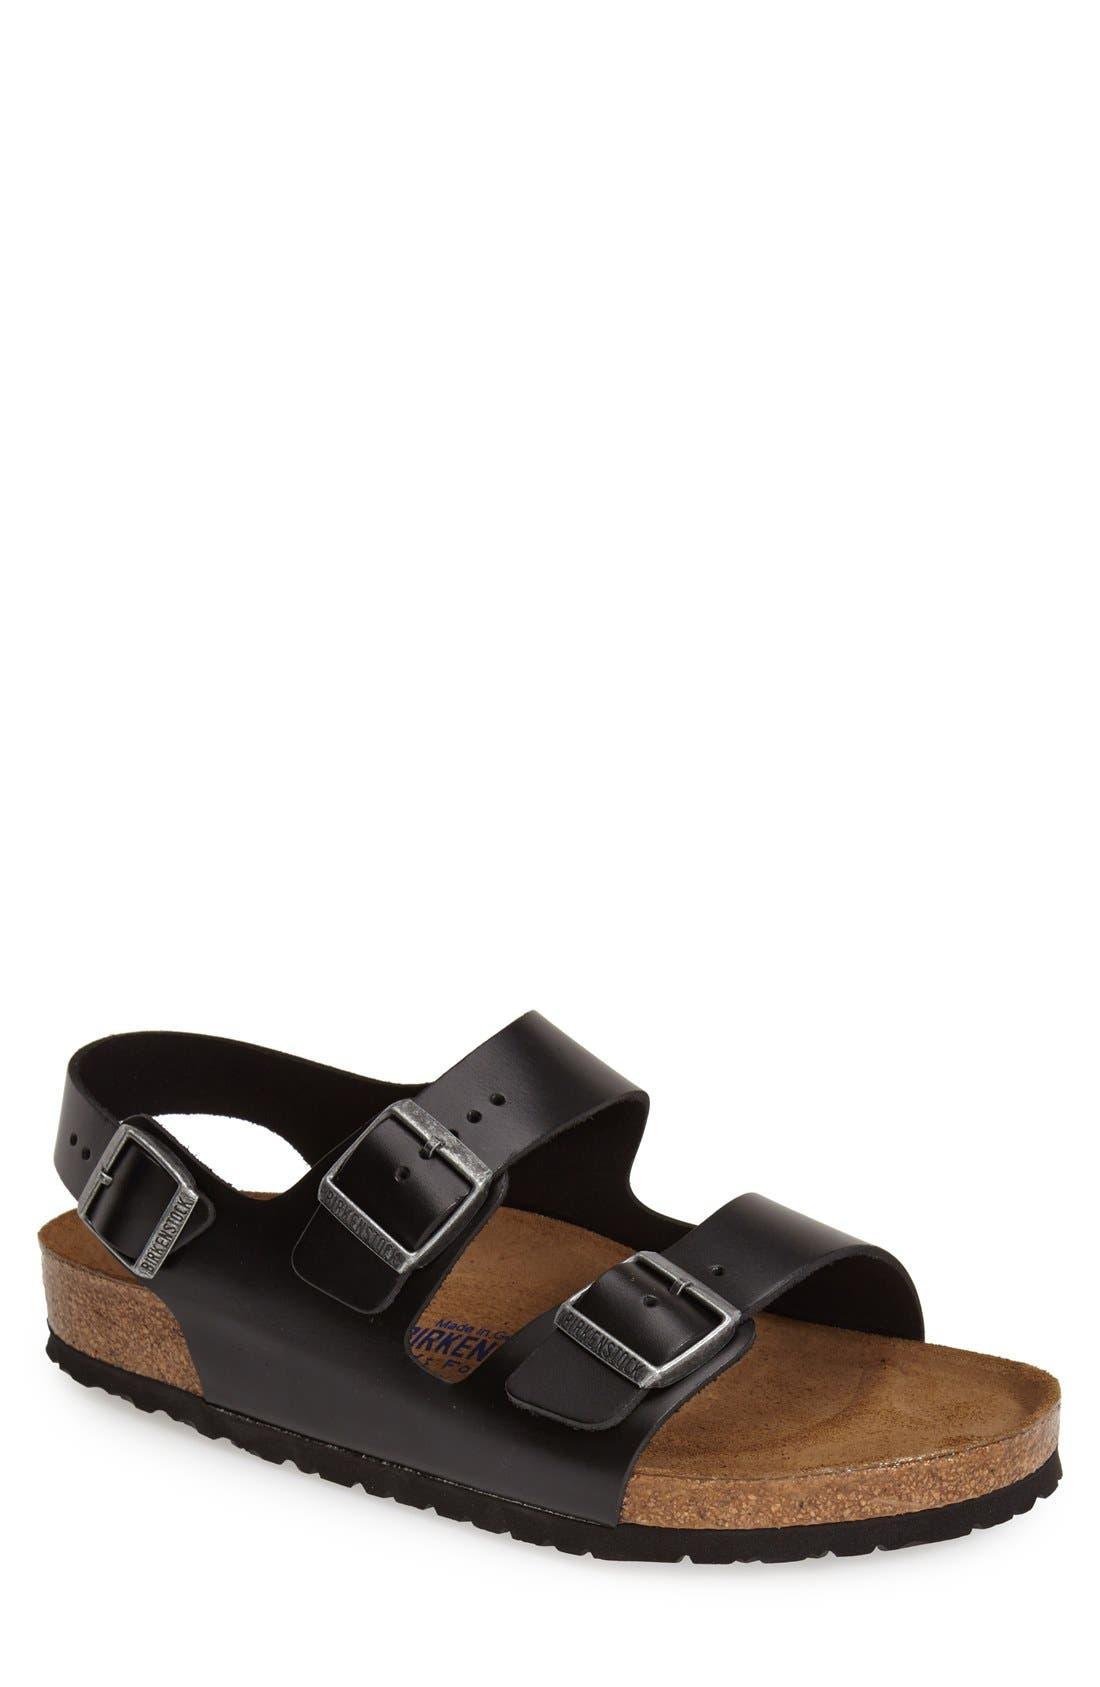 'Milano' Soft Footbed Sandal,                         Main,                         color, AMALFI BLACK